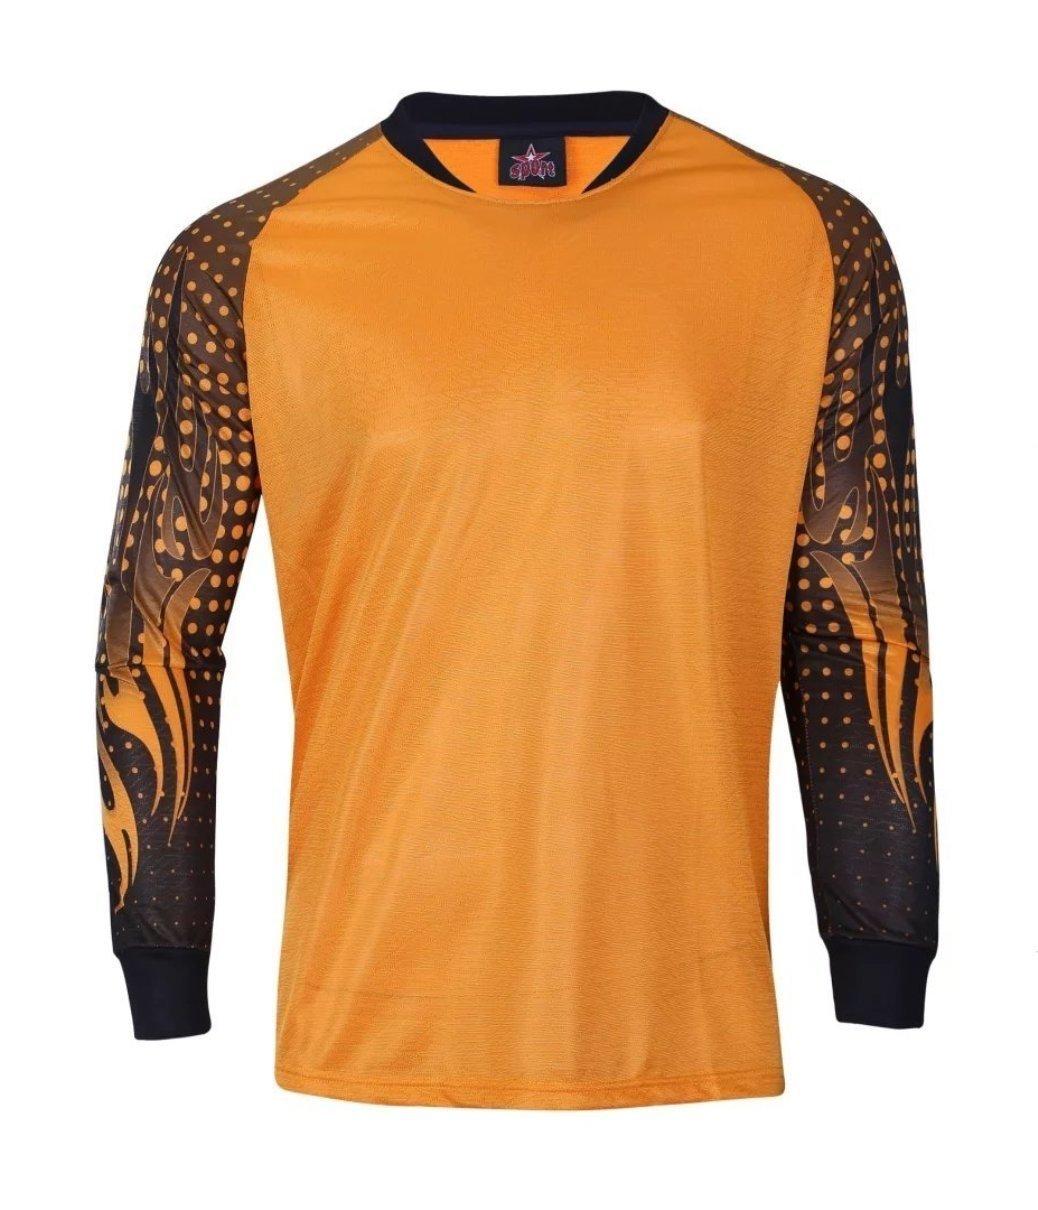 1 Stop Soccer Orange Goalkeeper Jersey Padded Elbows